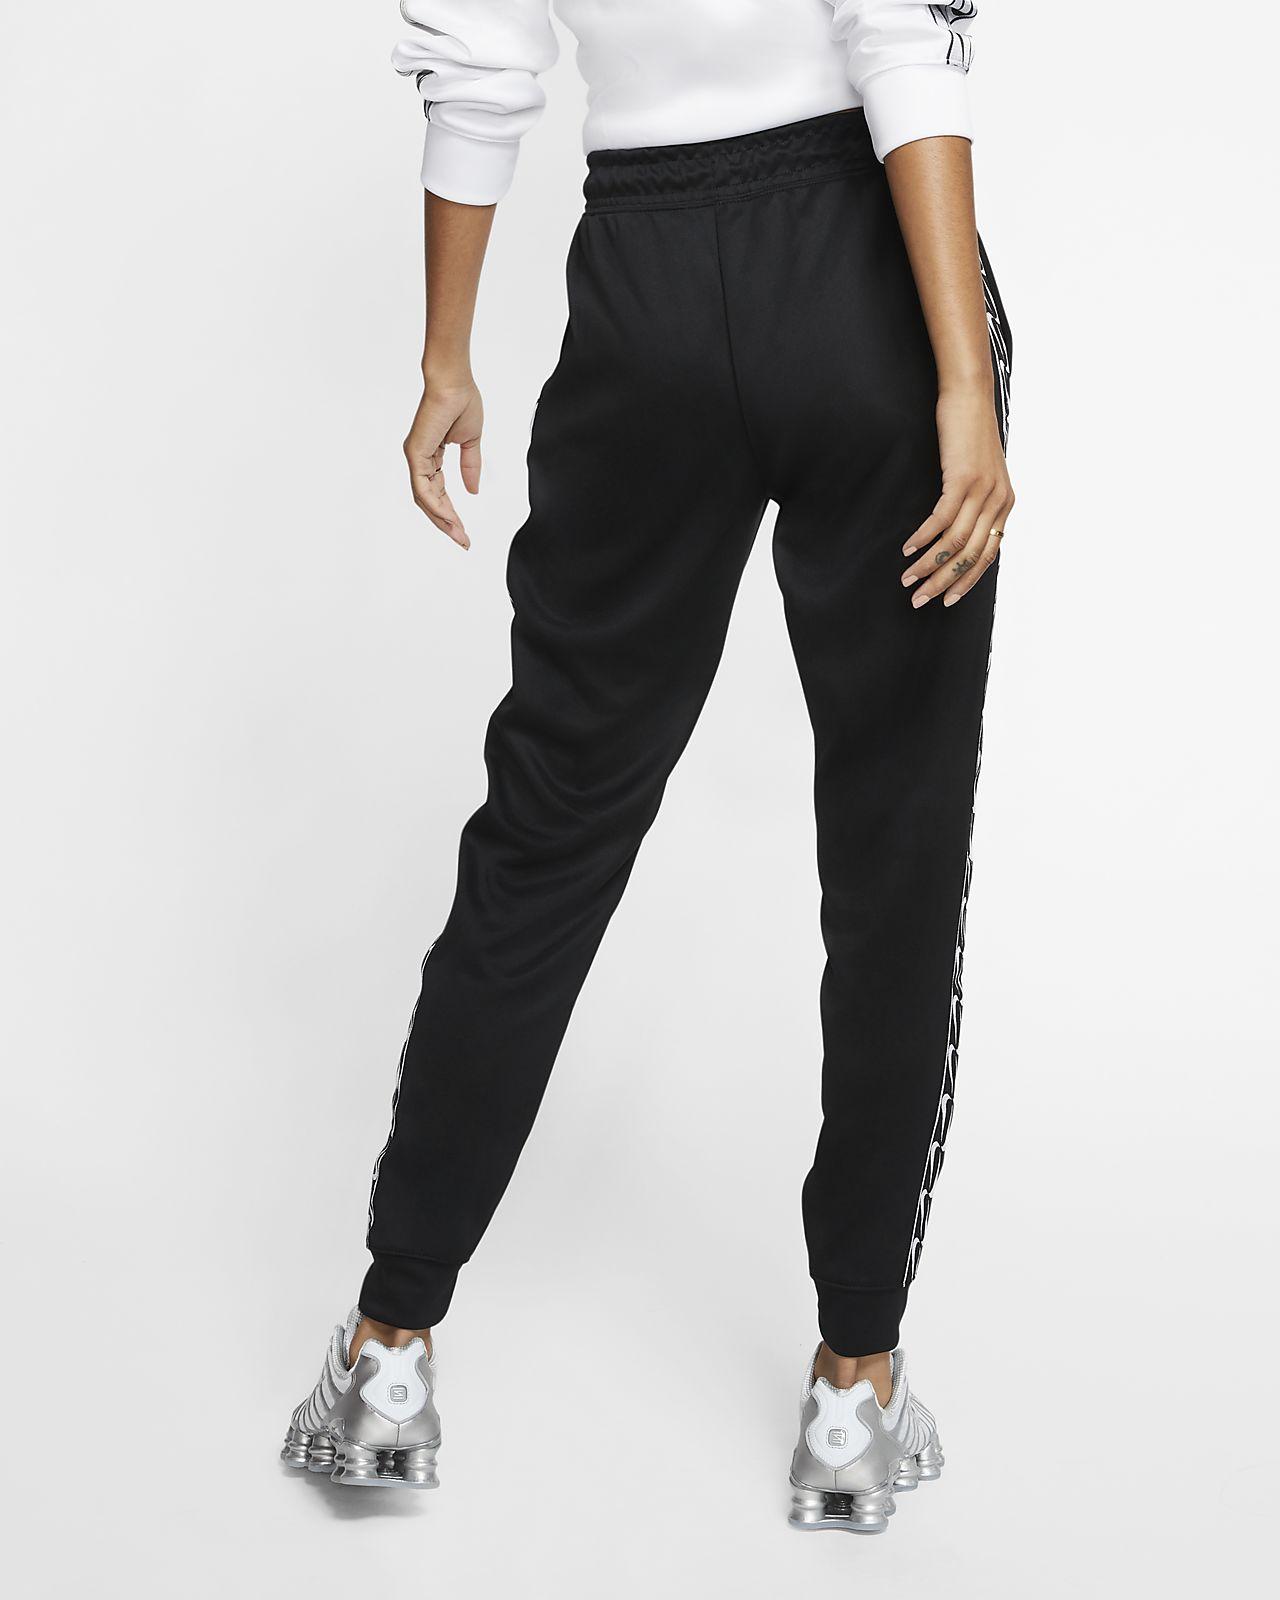 Pantaloni jogger con logo Nike Sportswear - Donna